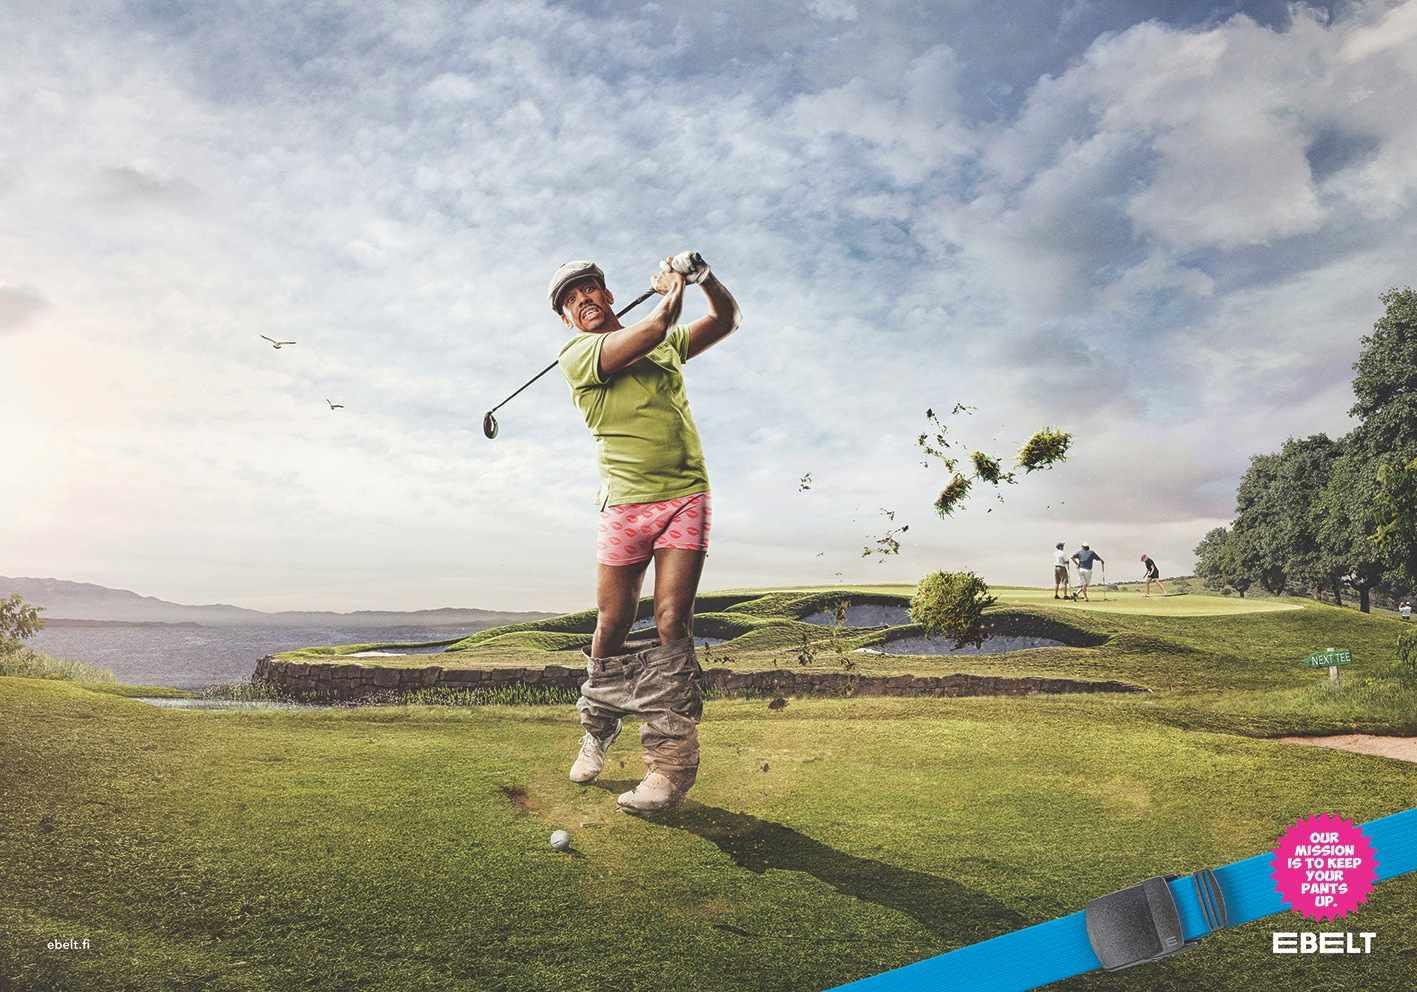 ebelt_poster_50x35cm_golf_72dpi_aotw